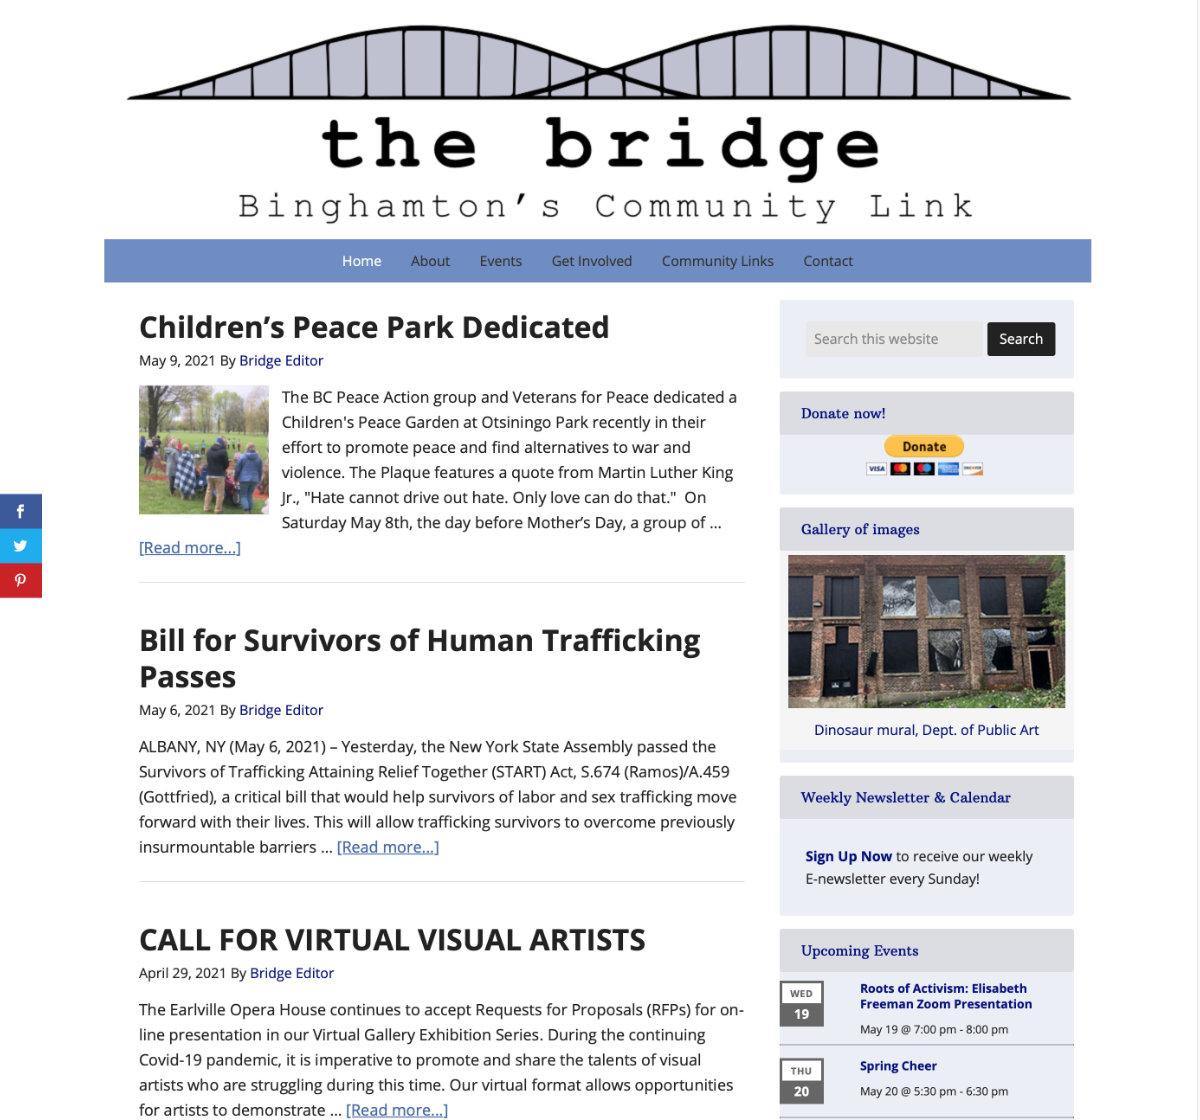 A community website for the Binghamton NY area.  Visit website binghamtonbridge.org